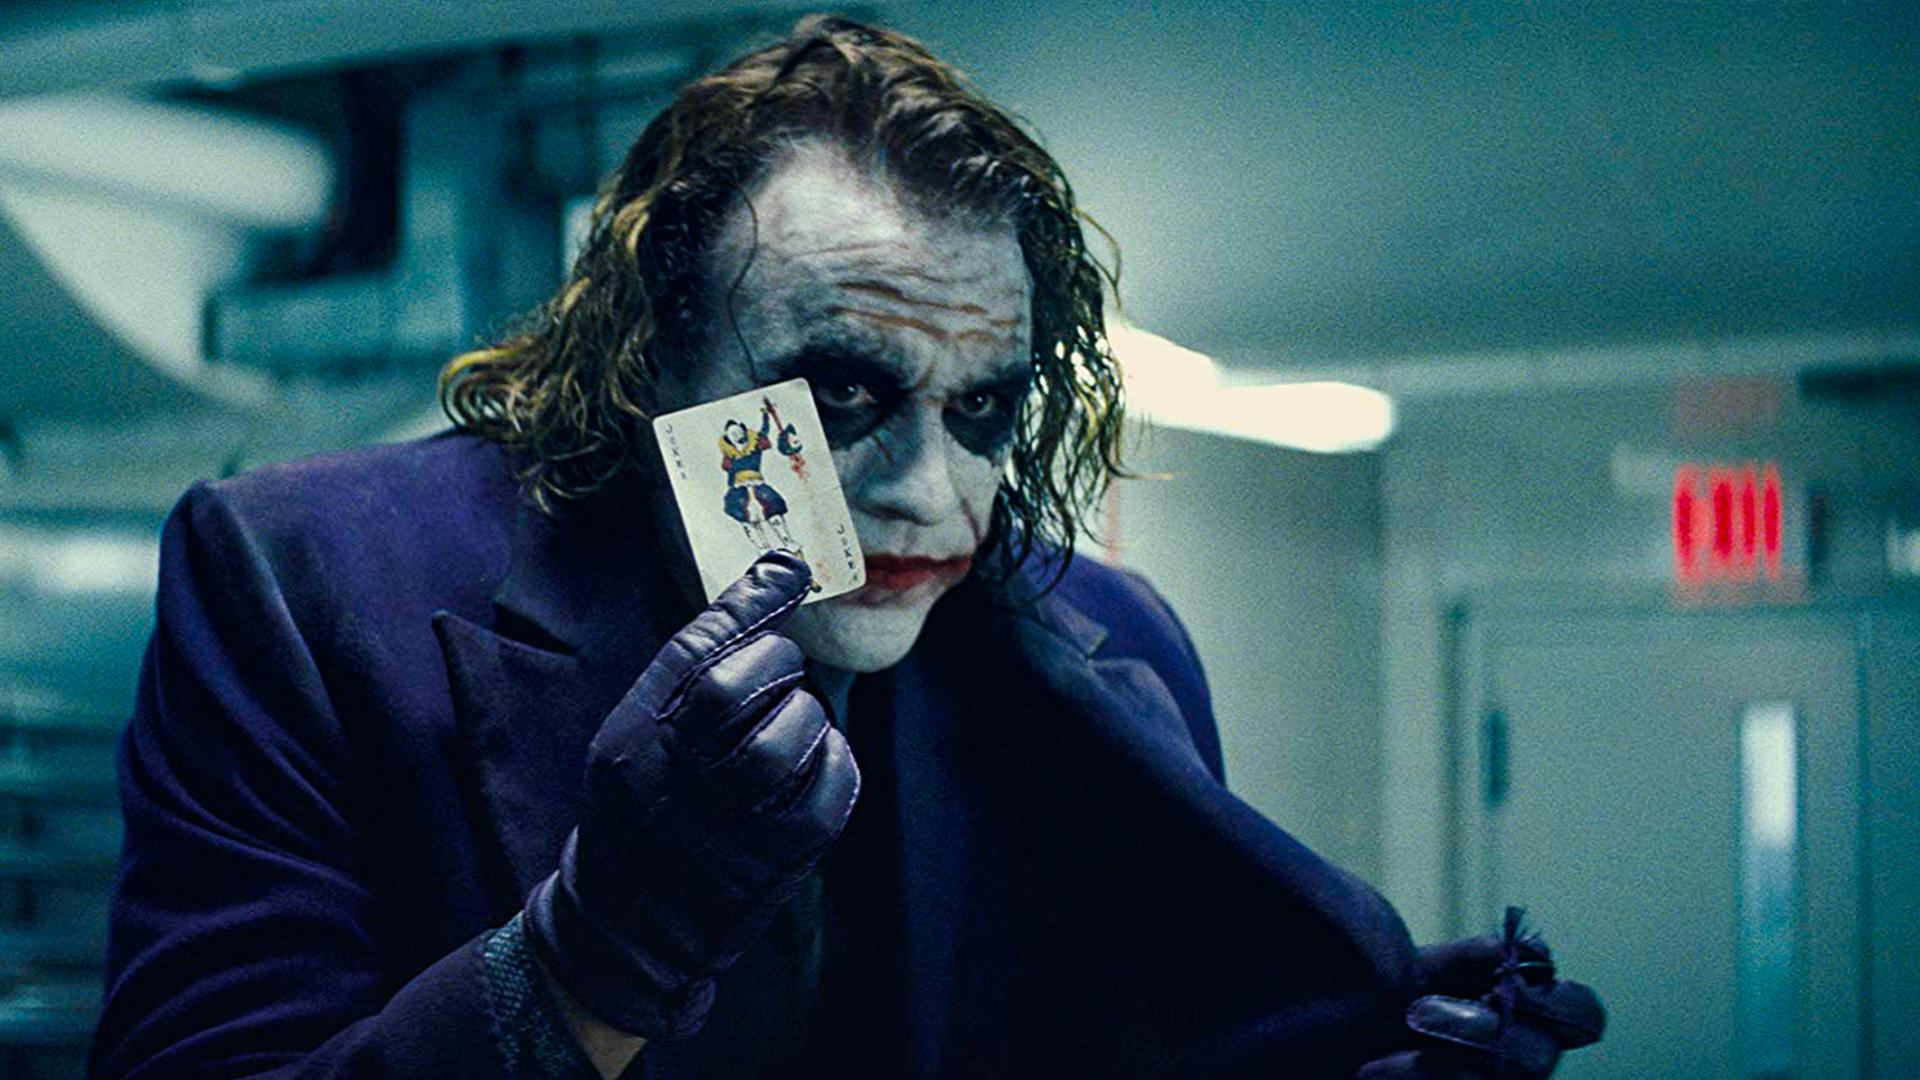 Joker's-character-in-the-Dark-Knight